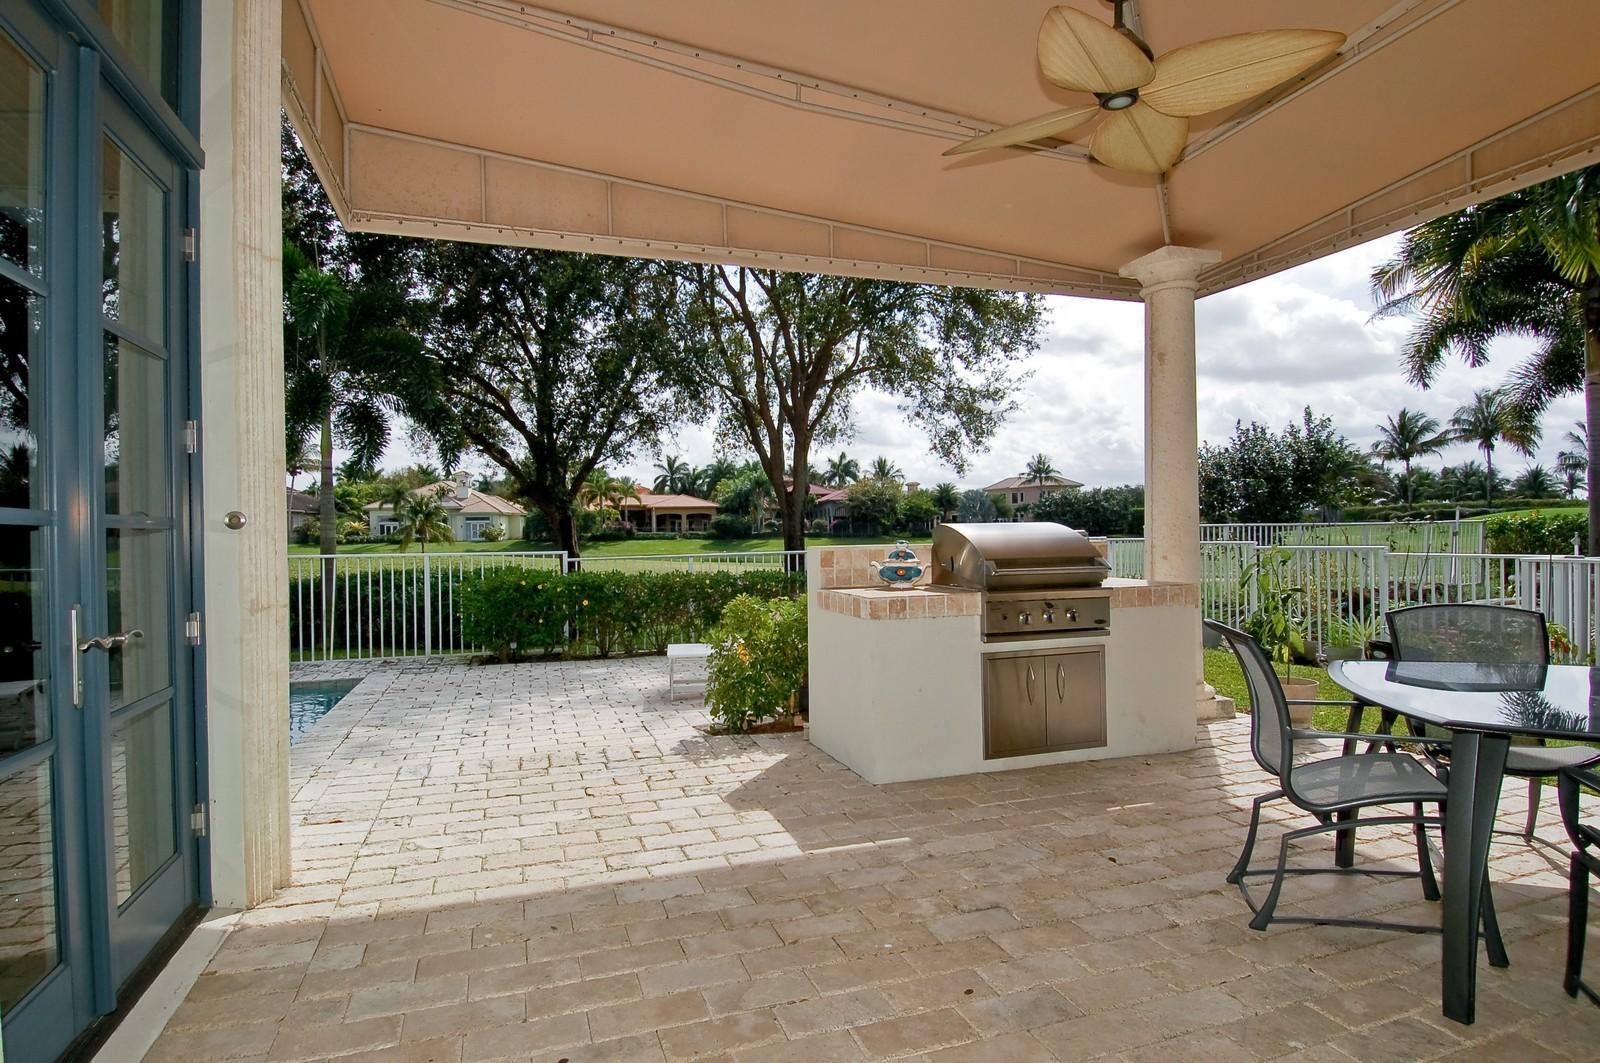 Real Estate Photography - 7478 Valencia Dr, Boca Raton, FL, 33433 - Loggia